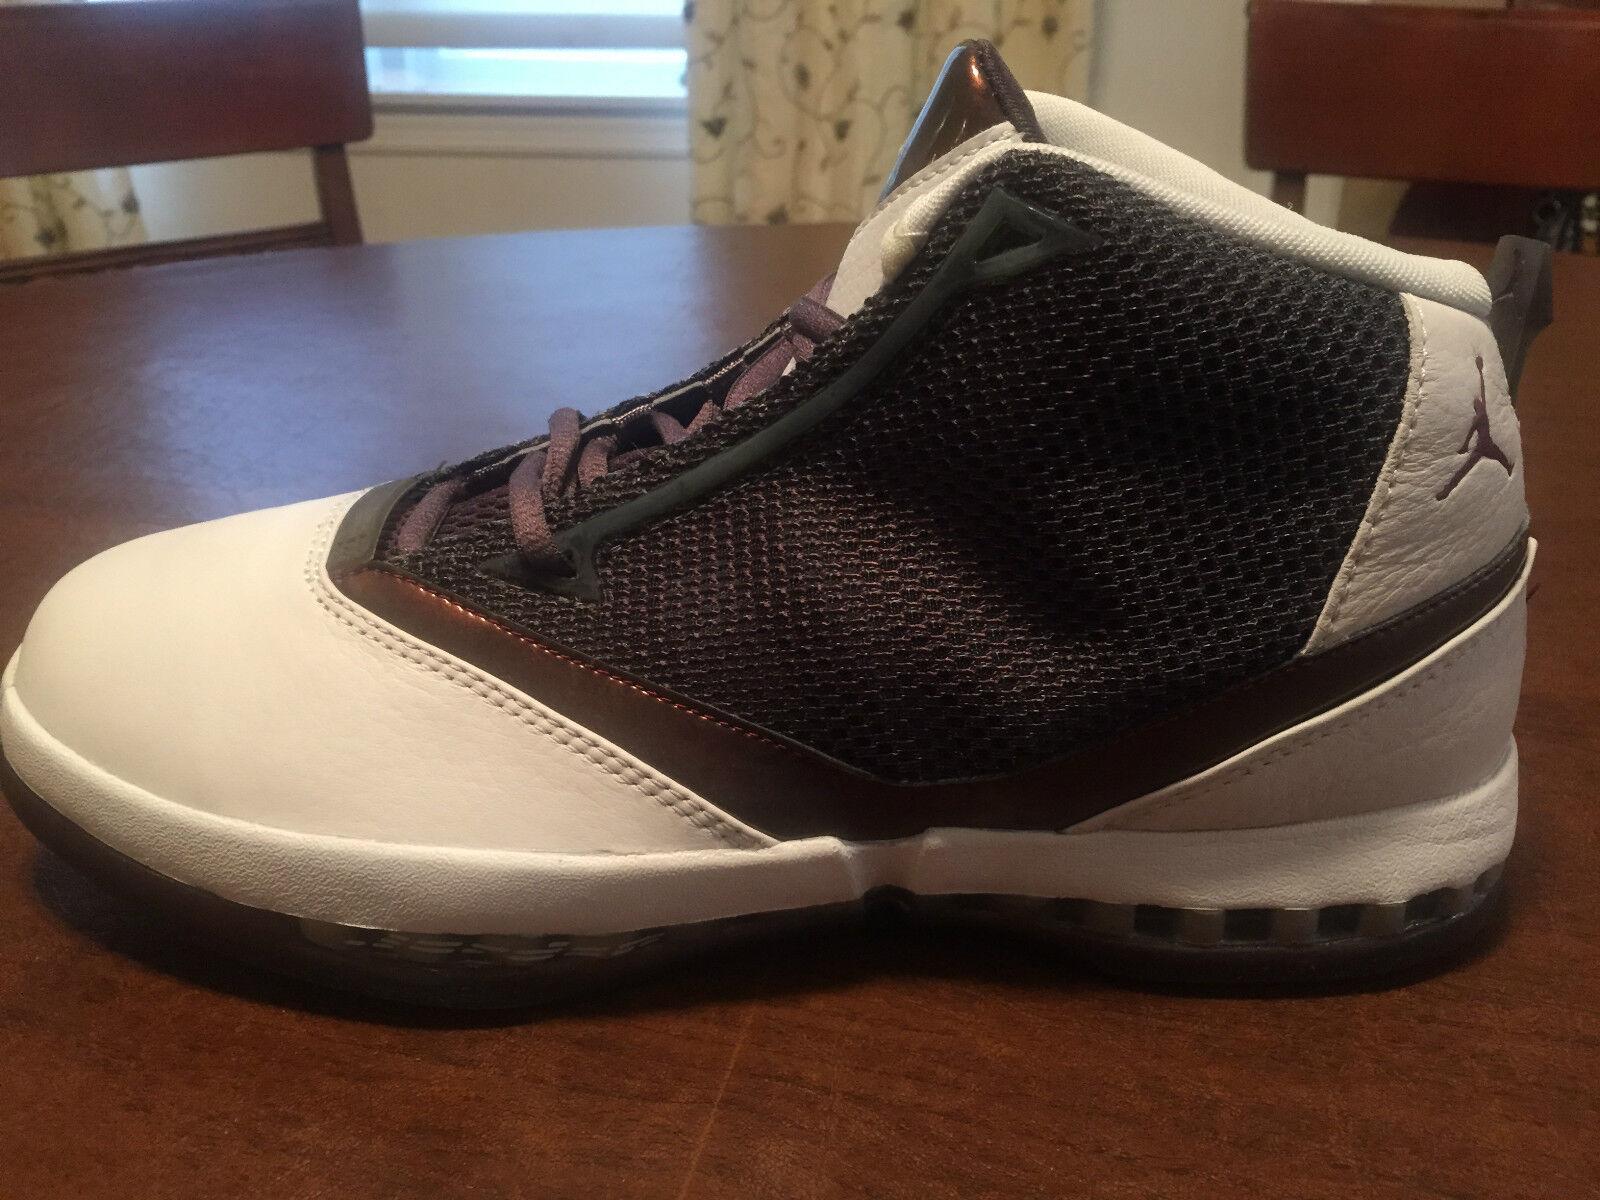 2001  Nike Air Jordan XVI 16+ Q Cherrywood Size 10.5 - 136080-020 Deadstock